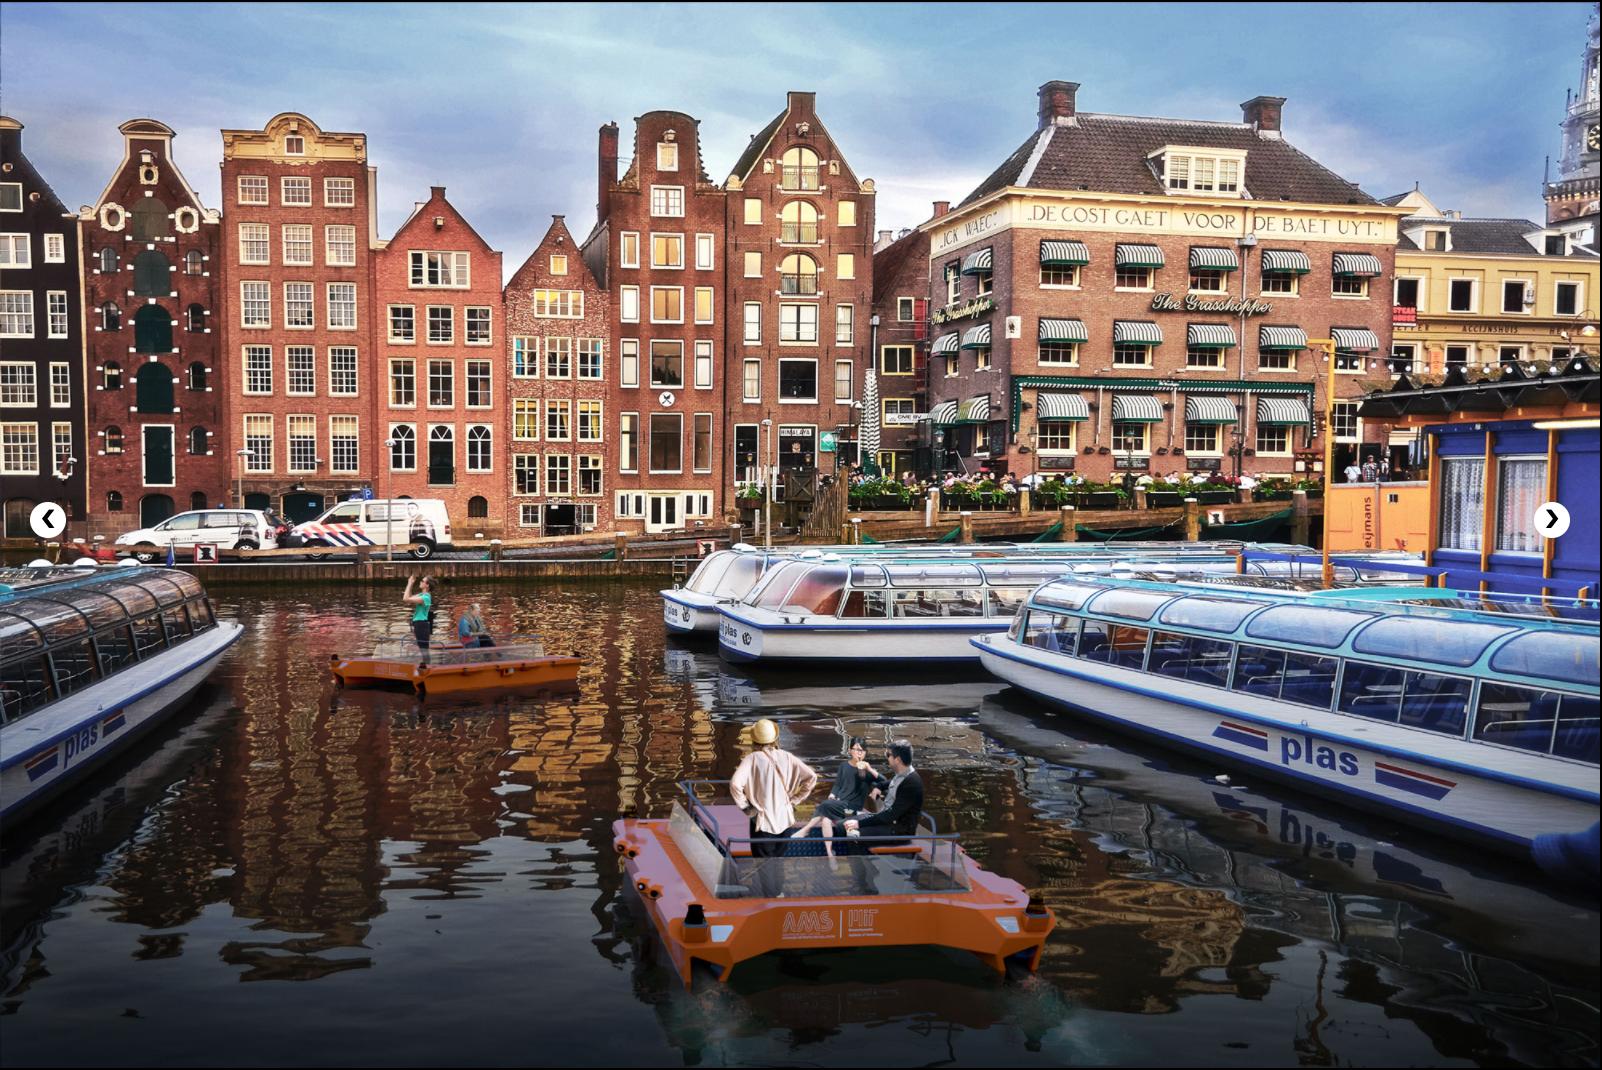 ....ROBOAT..    荷兰阿姆斯特丹ROBOAT....